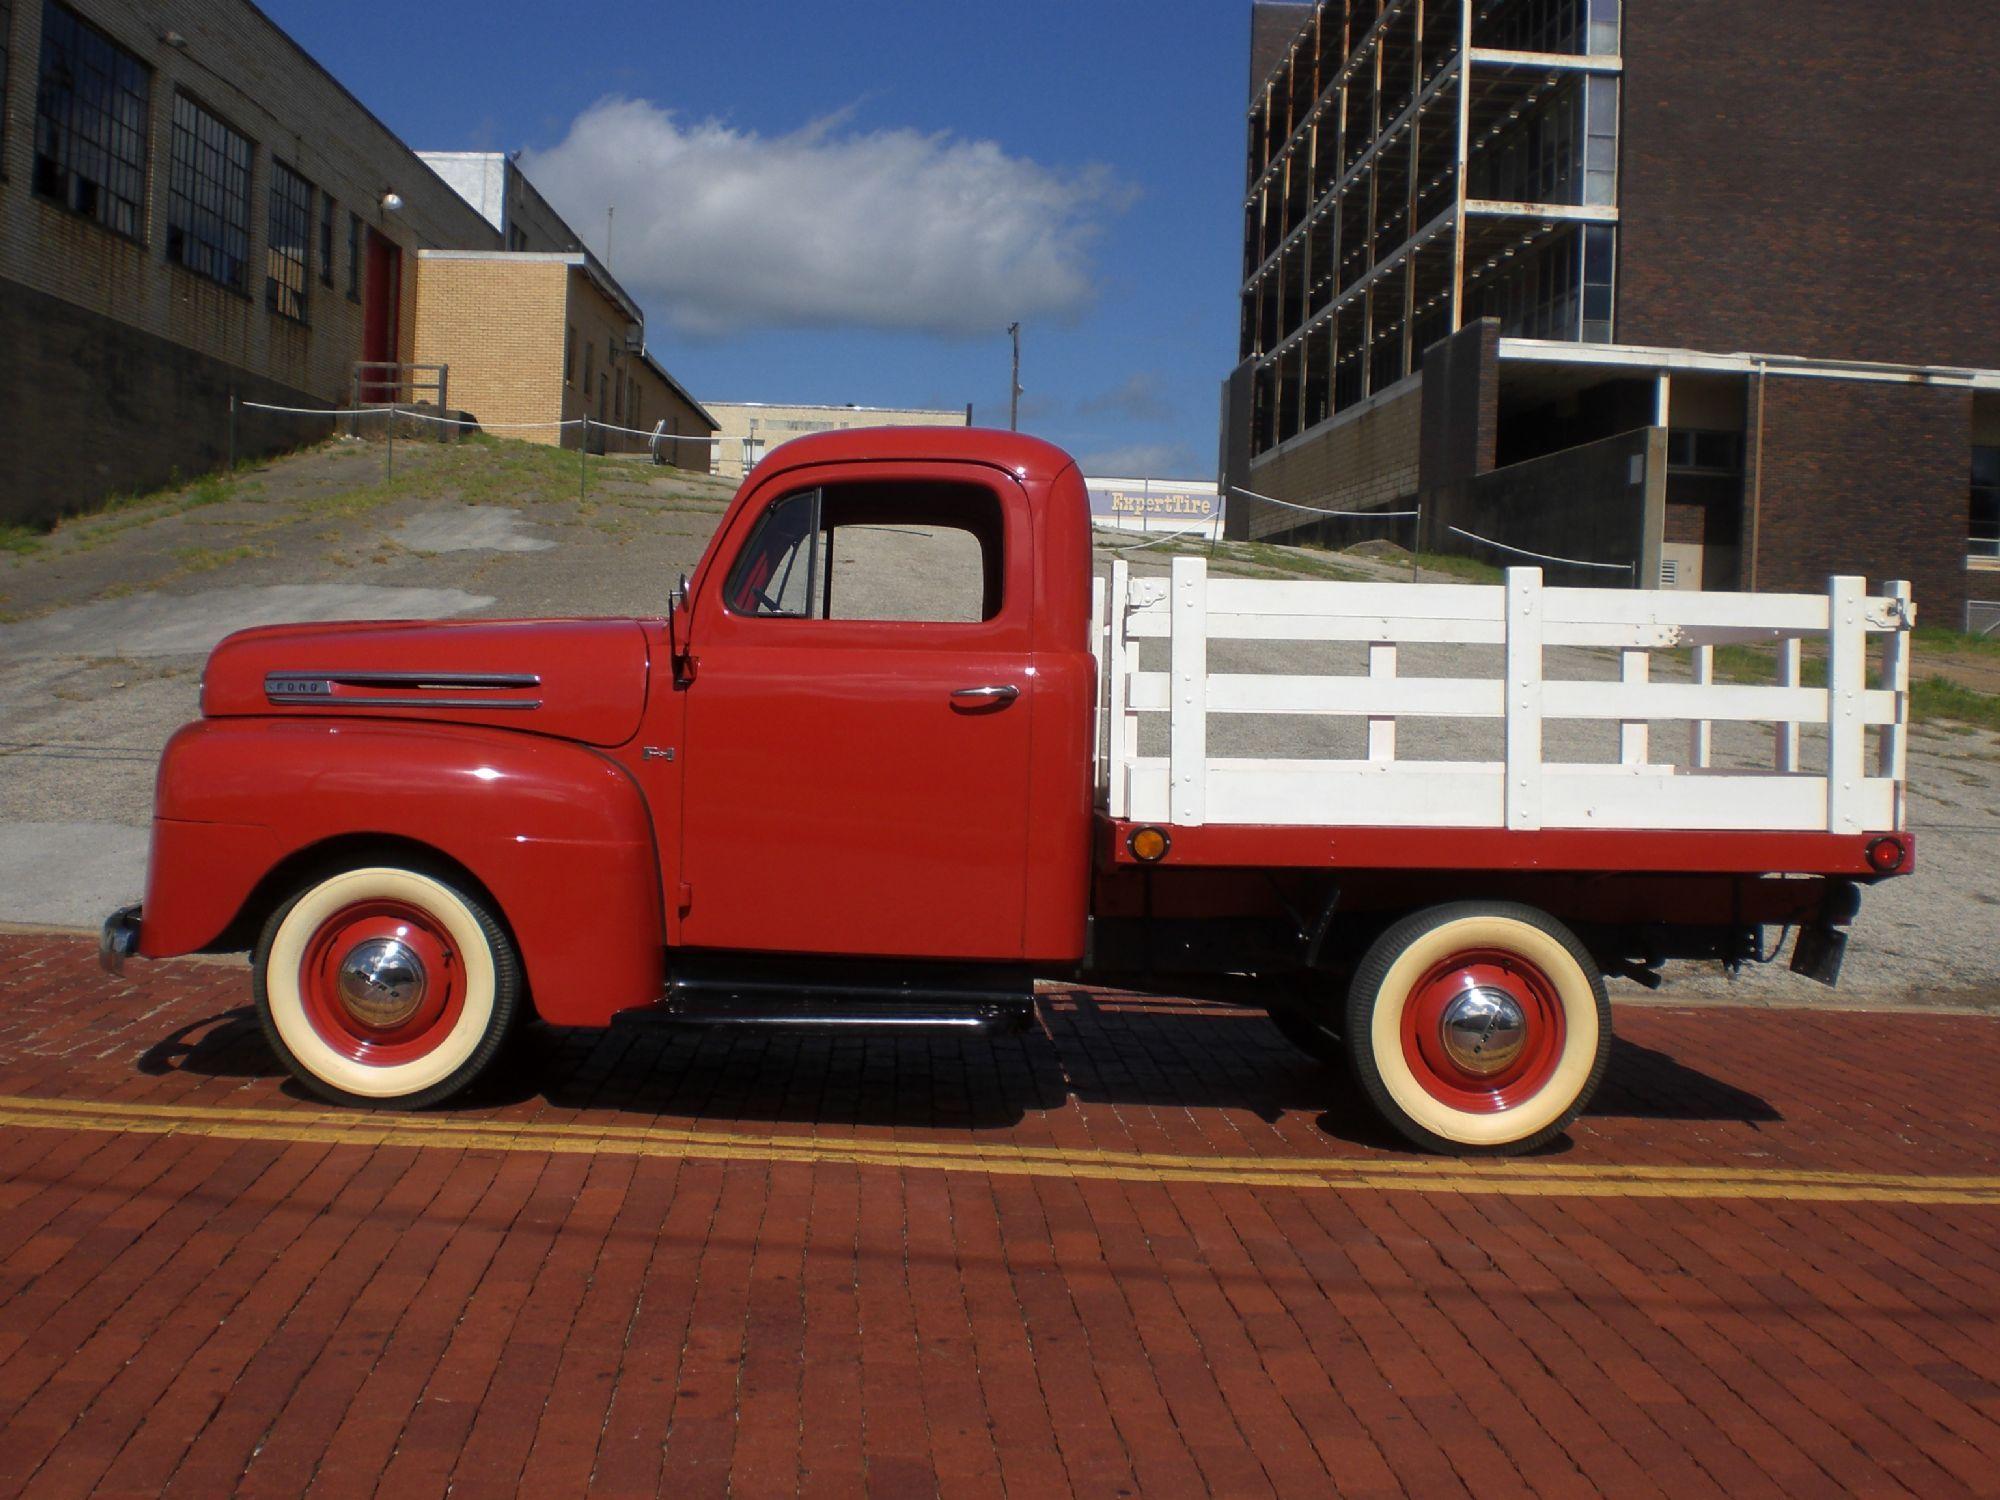 Iis 8 5 Detailed Error 404 0 Not Found Classic Pickup Trucks 1950 Ford Pickup Trucks